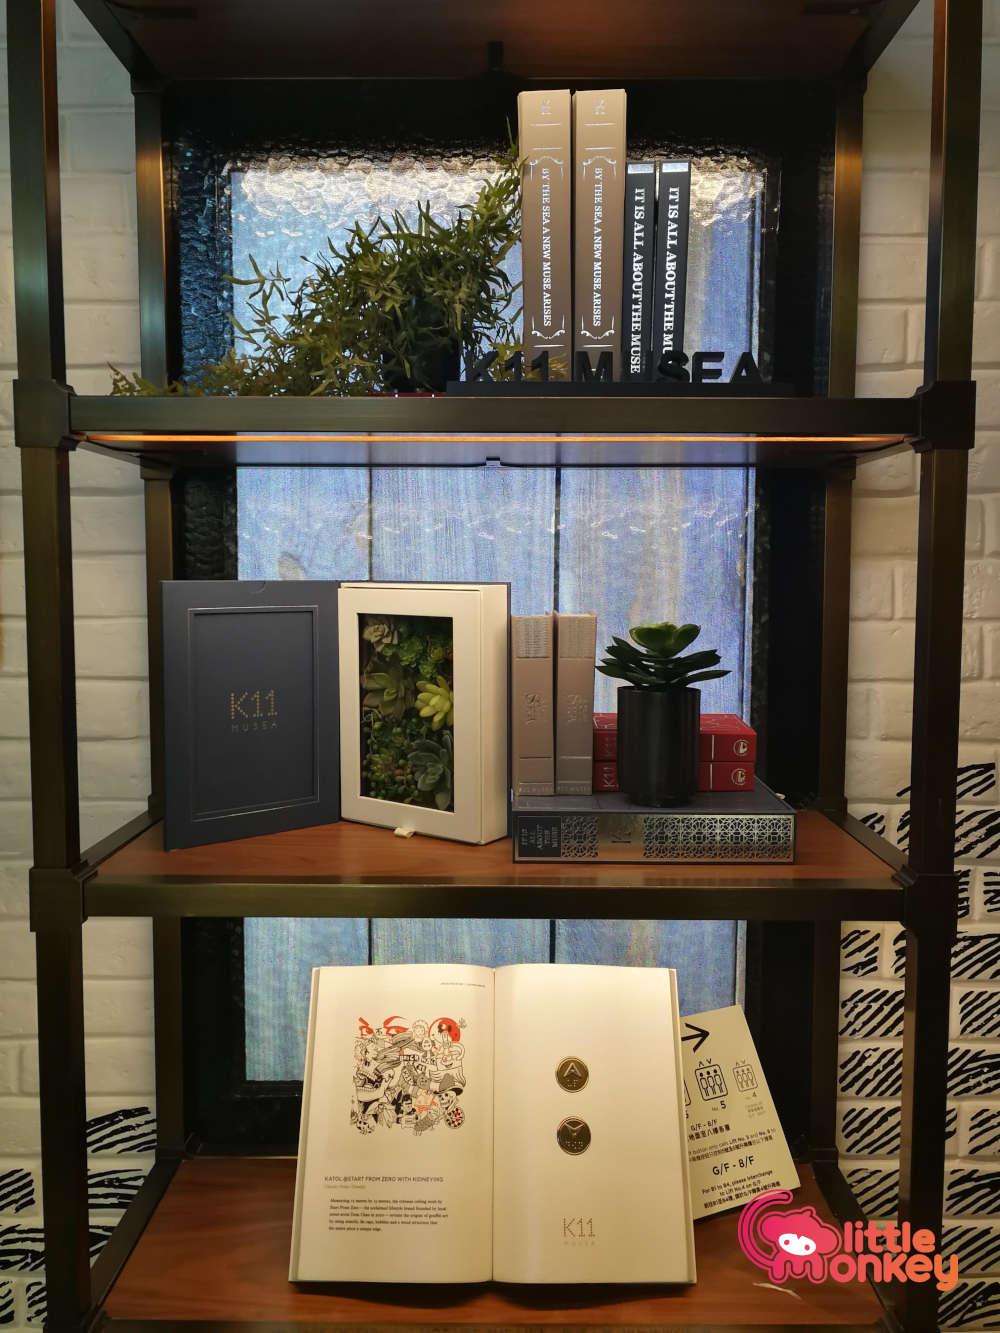 K11 Musea Elevator Book Shelf